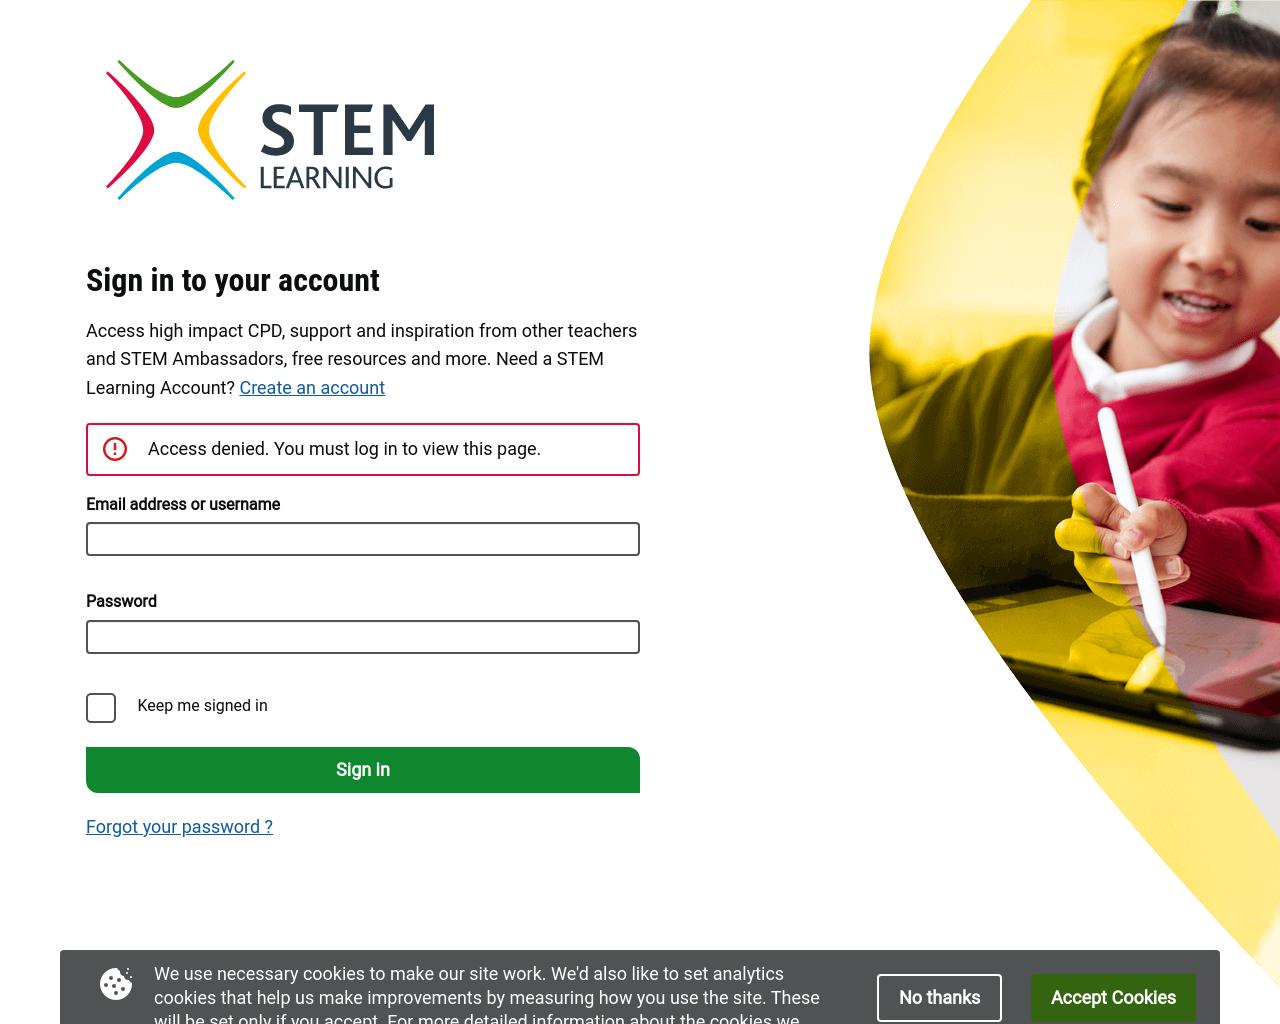 Stem.org.uk